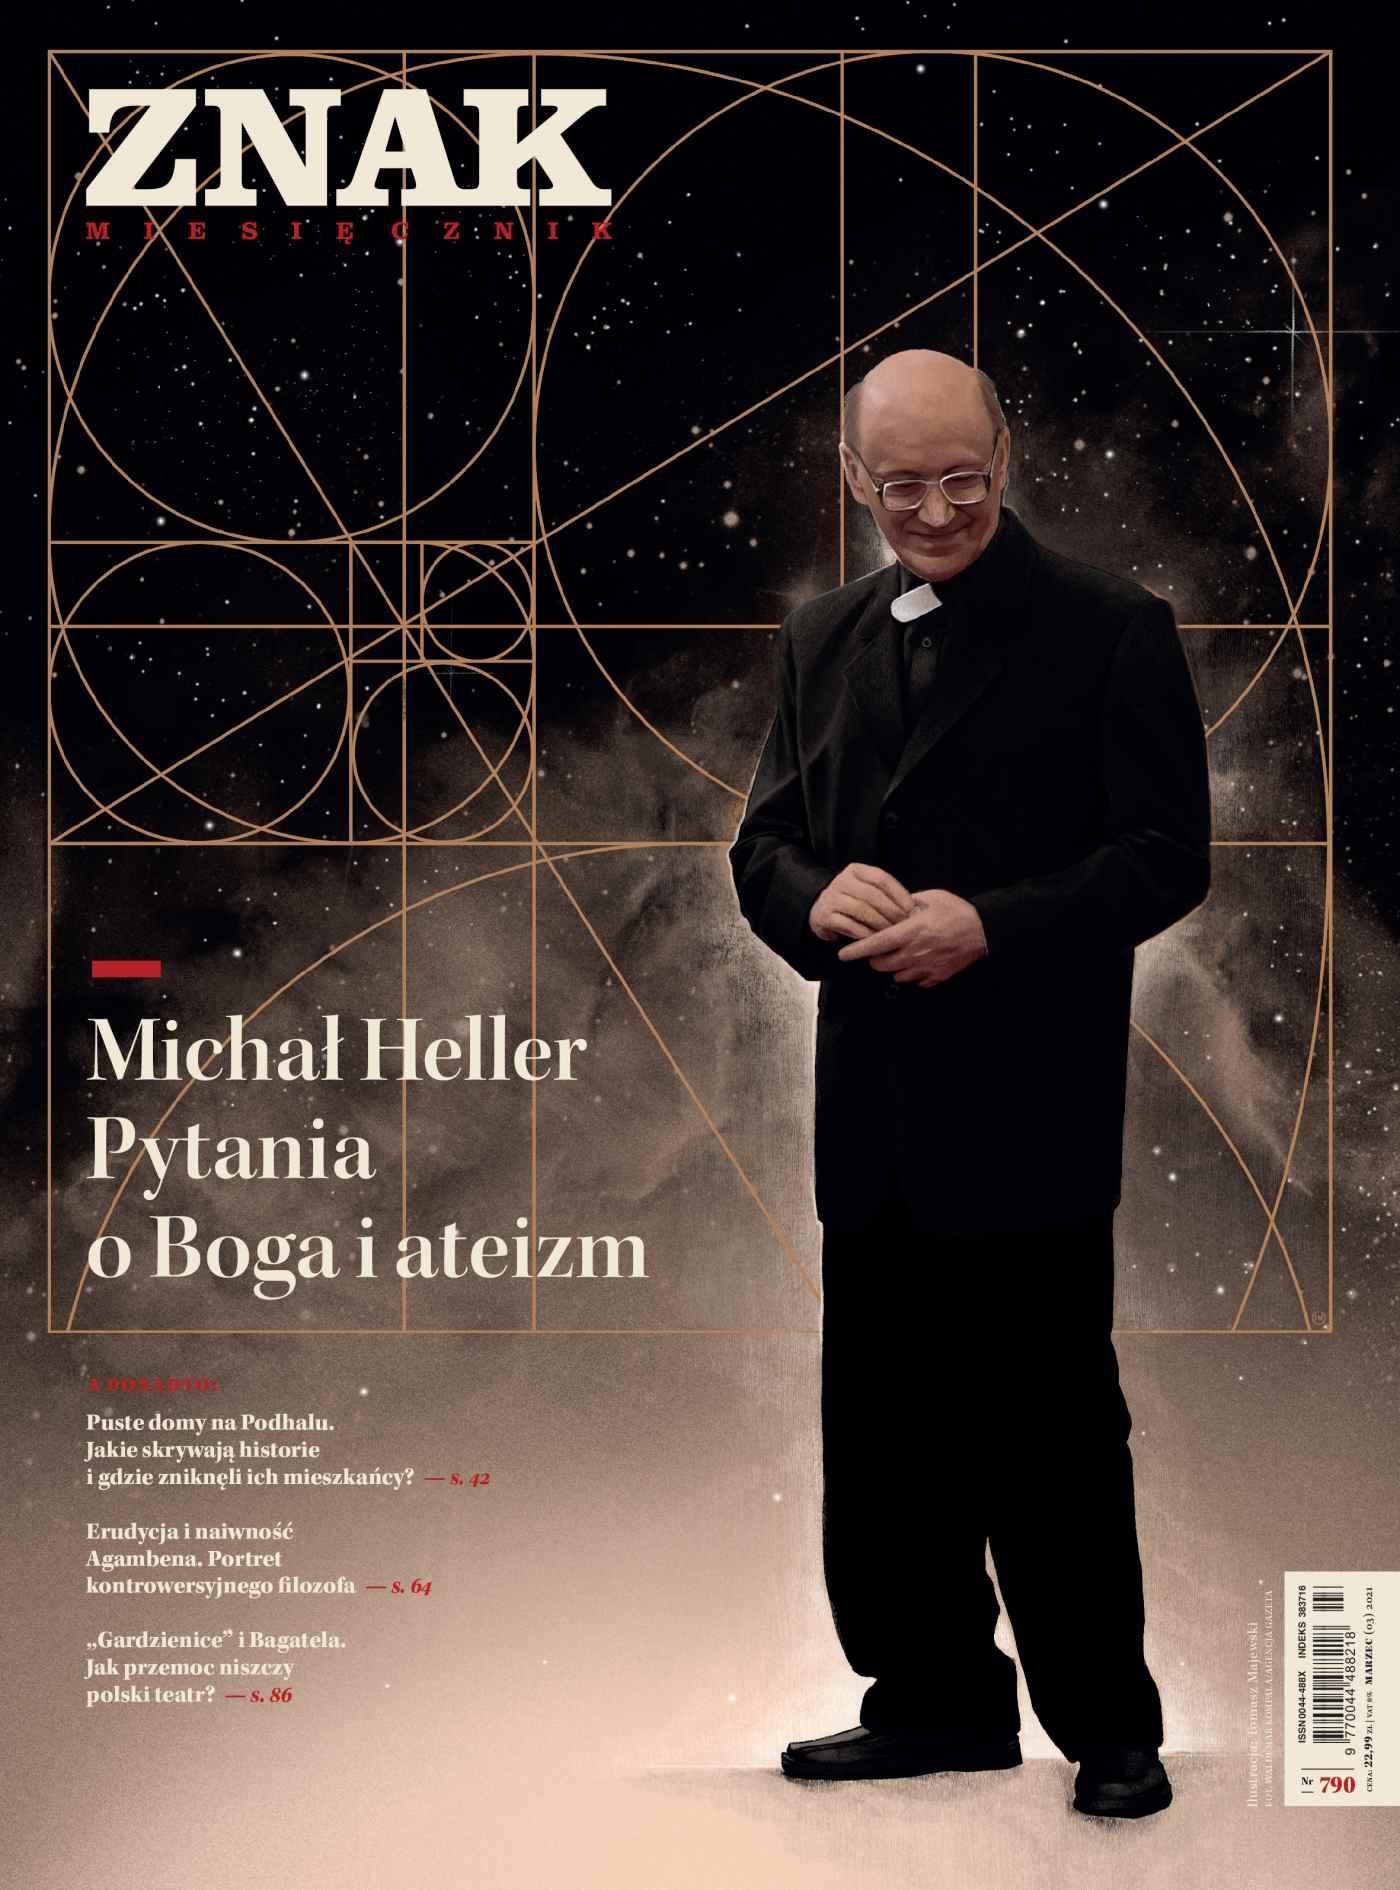 Miesięcznik Znak nr 790. Michał Heller. Pytania o Boga i ateizm - Ebook (Książka na Kindle) do pobrania w formacie MOBI